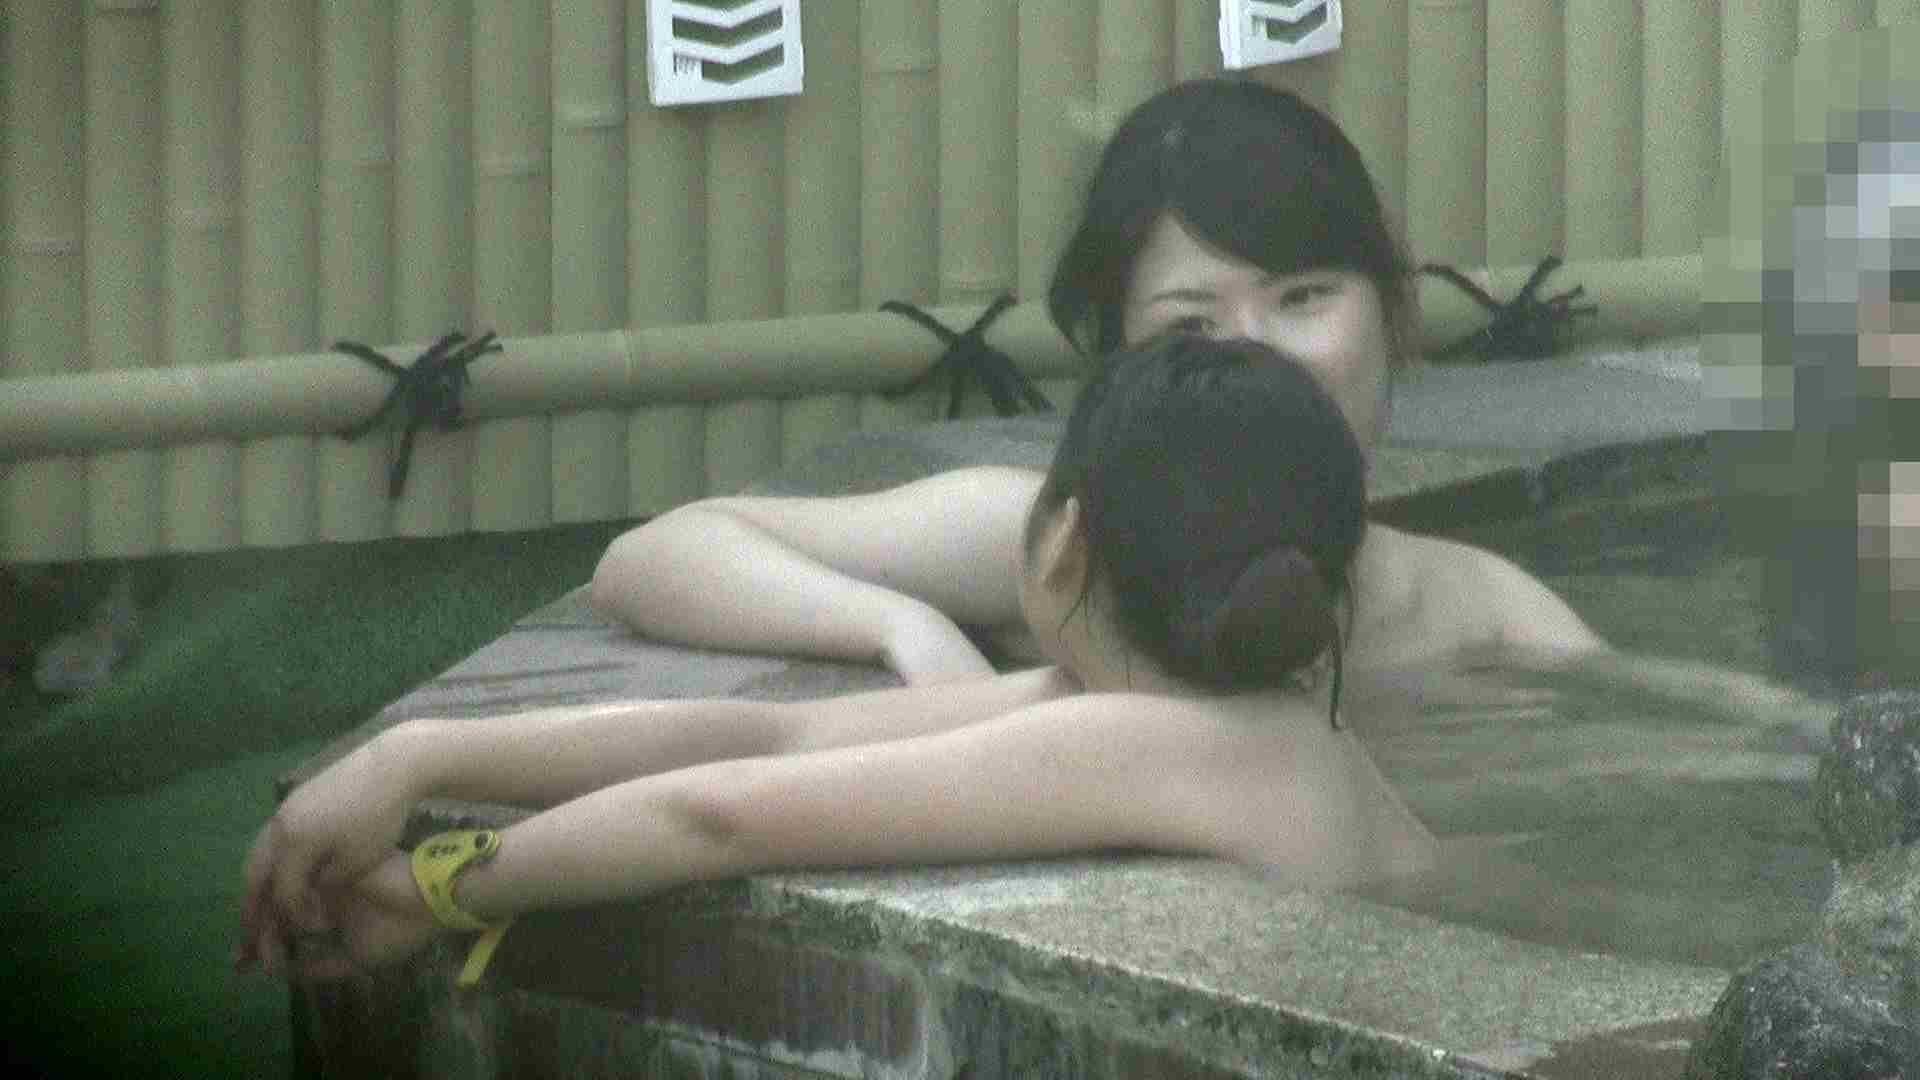 Aquaな露天風呂Vol.206 露天 | HなOL  74pic 37